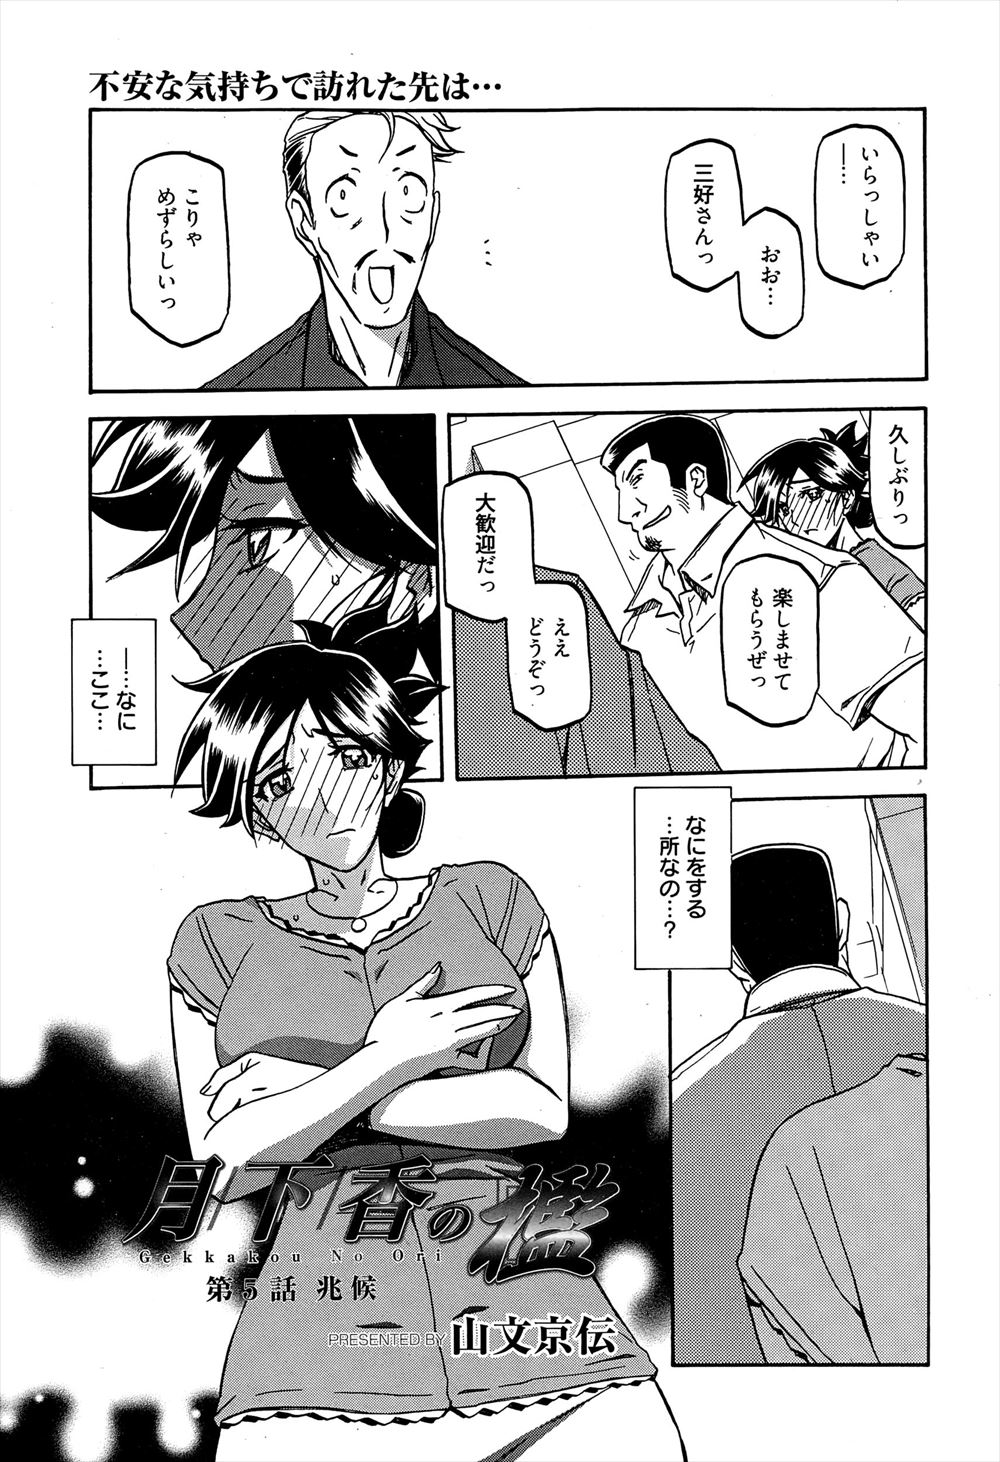 [山文京伝] 月下香の檻 第5話 (1)